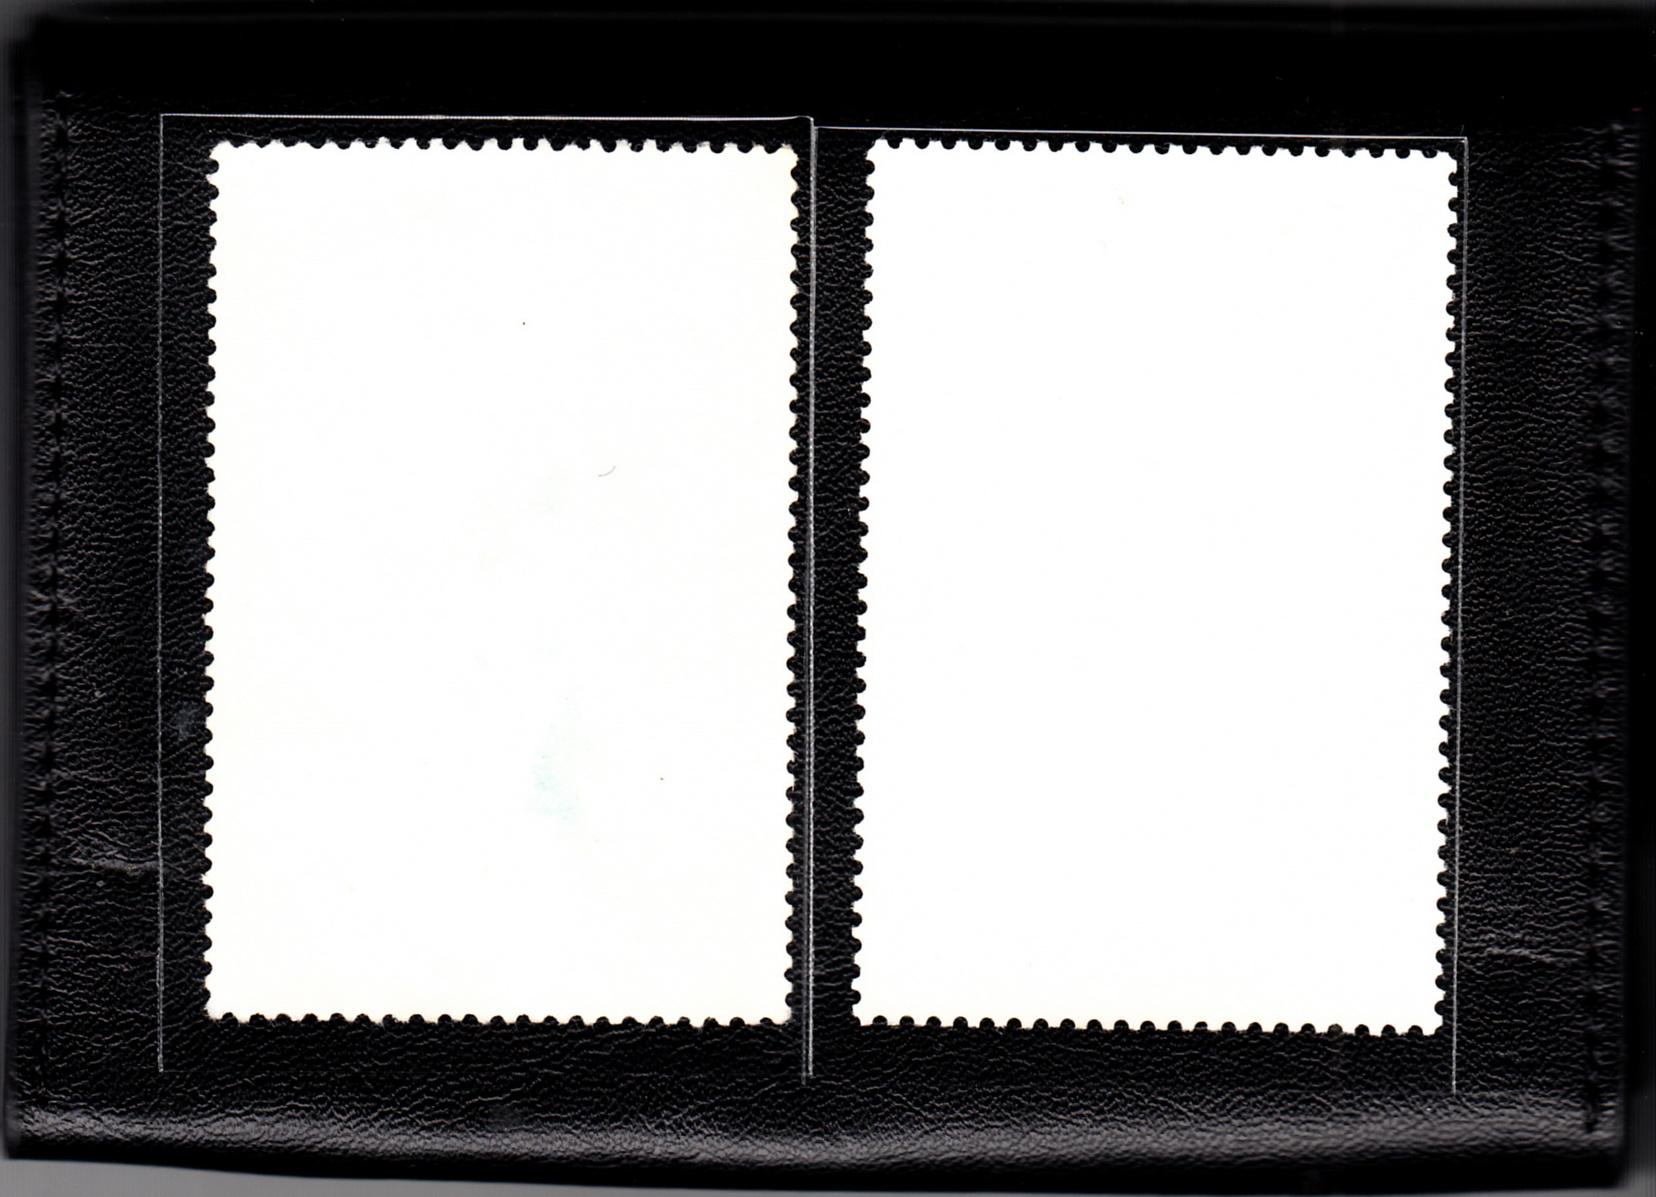 ppt 背景 背景图片 边框 模板 设计 矢量 矢量图 素材 相框 1656_1197